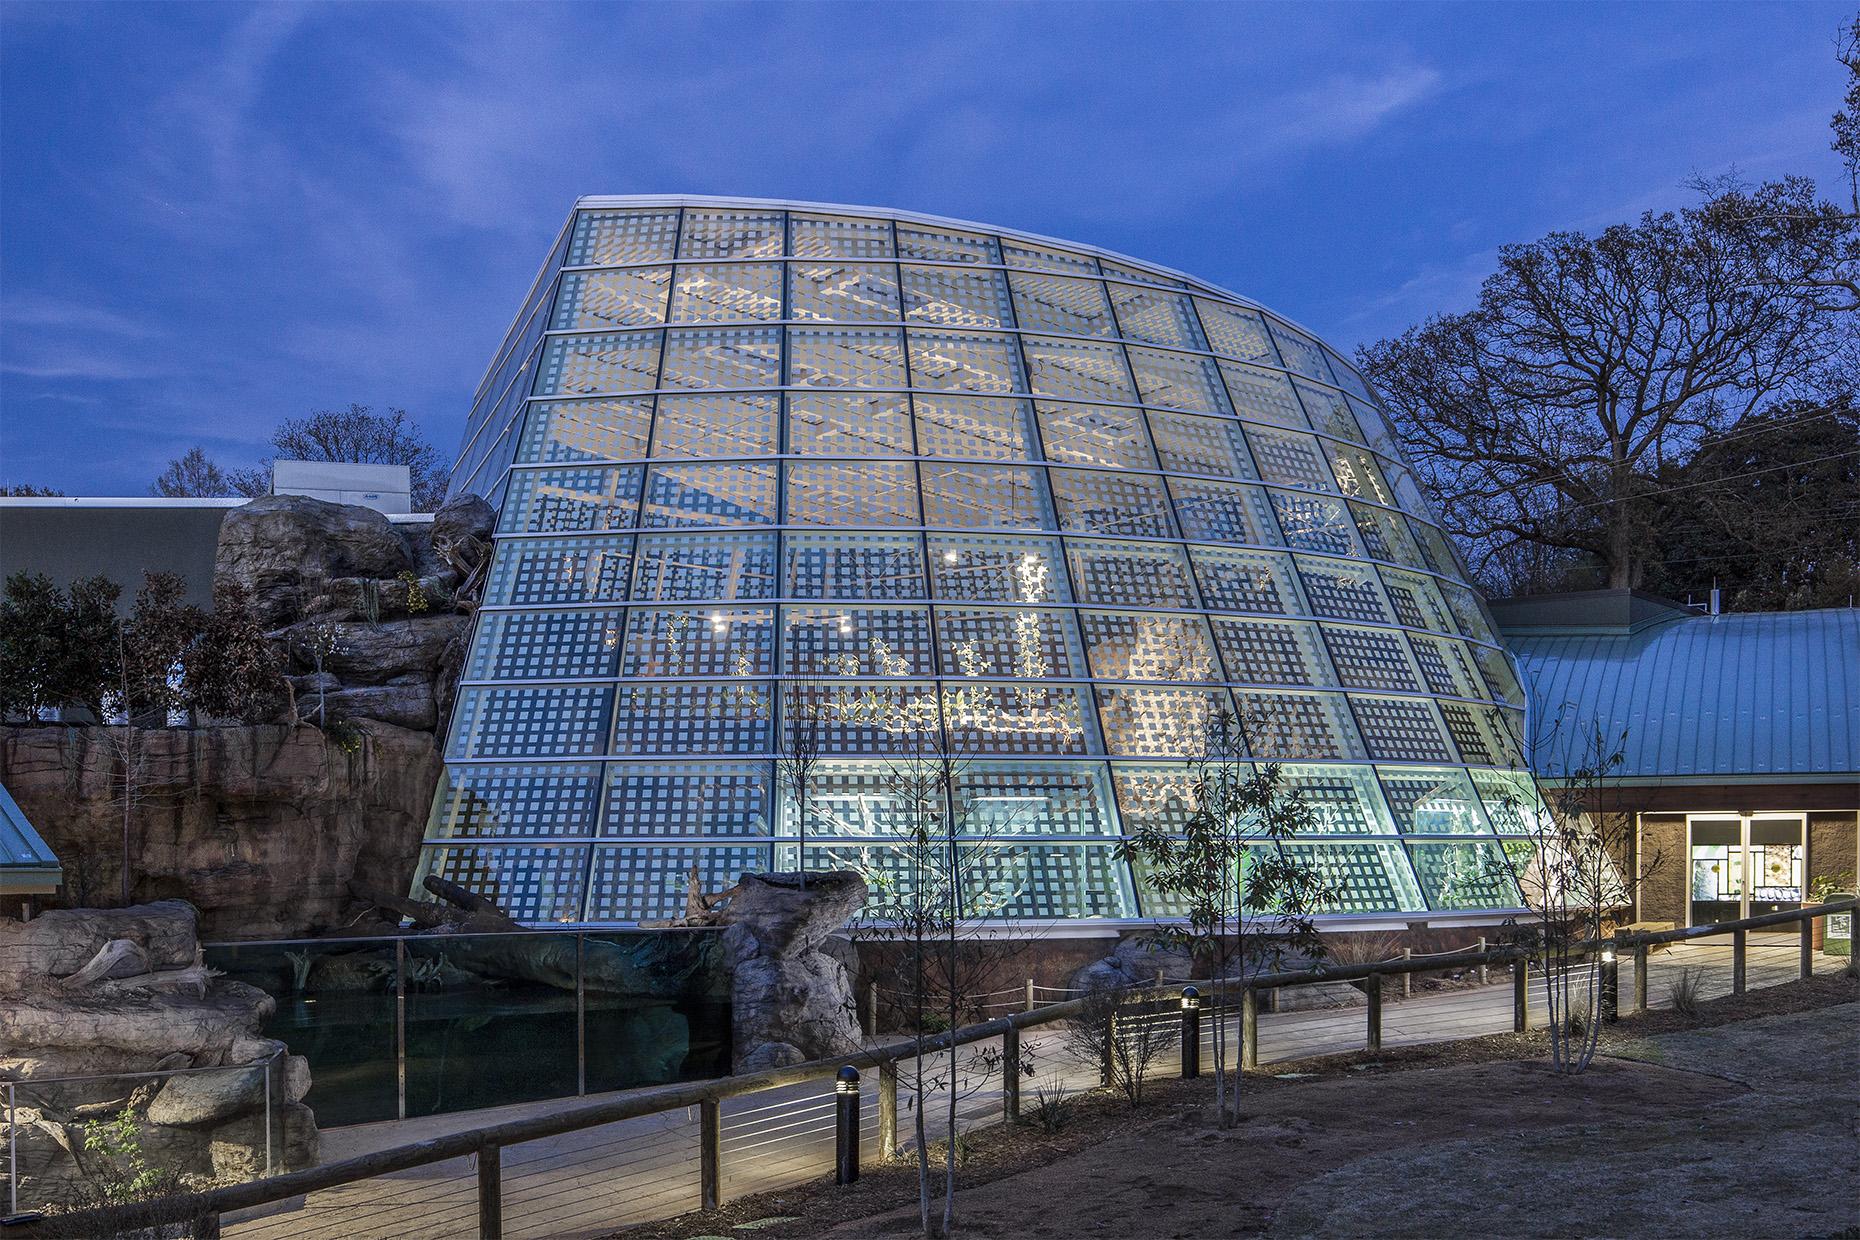 Zoo Atlanta - Reptile House // Clients: Architect: Torre Design // Builder: Winter Construction // Exhibit Contractor: Drill Construction